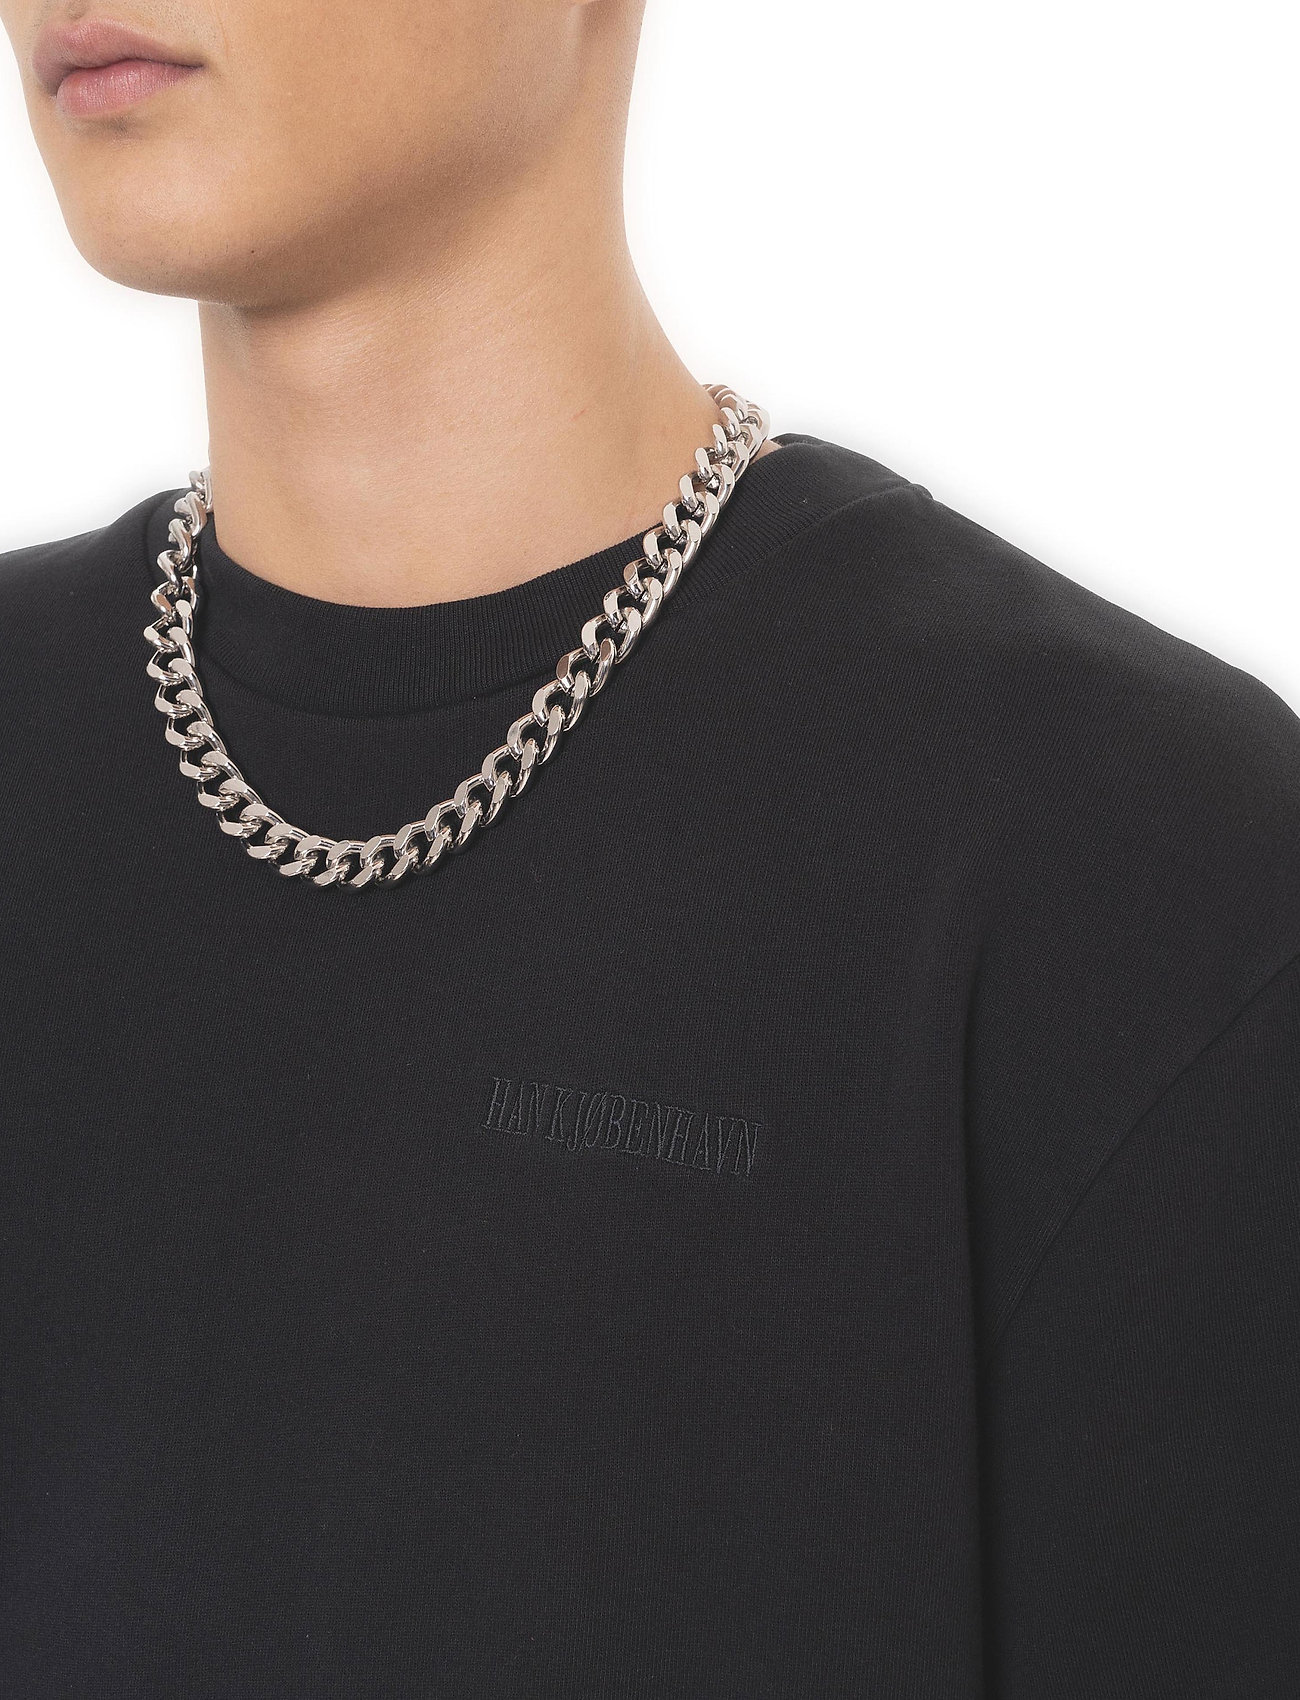 HAN Kjøbenhavn - Chunky Tee - basic t-shirts - faded black - 3